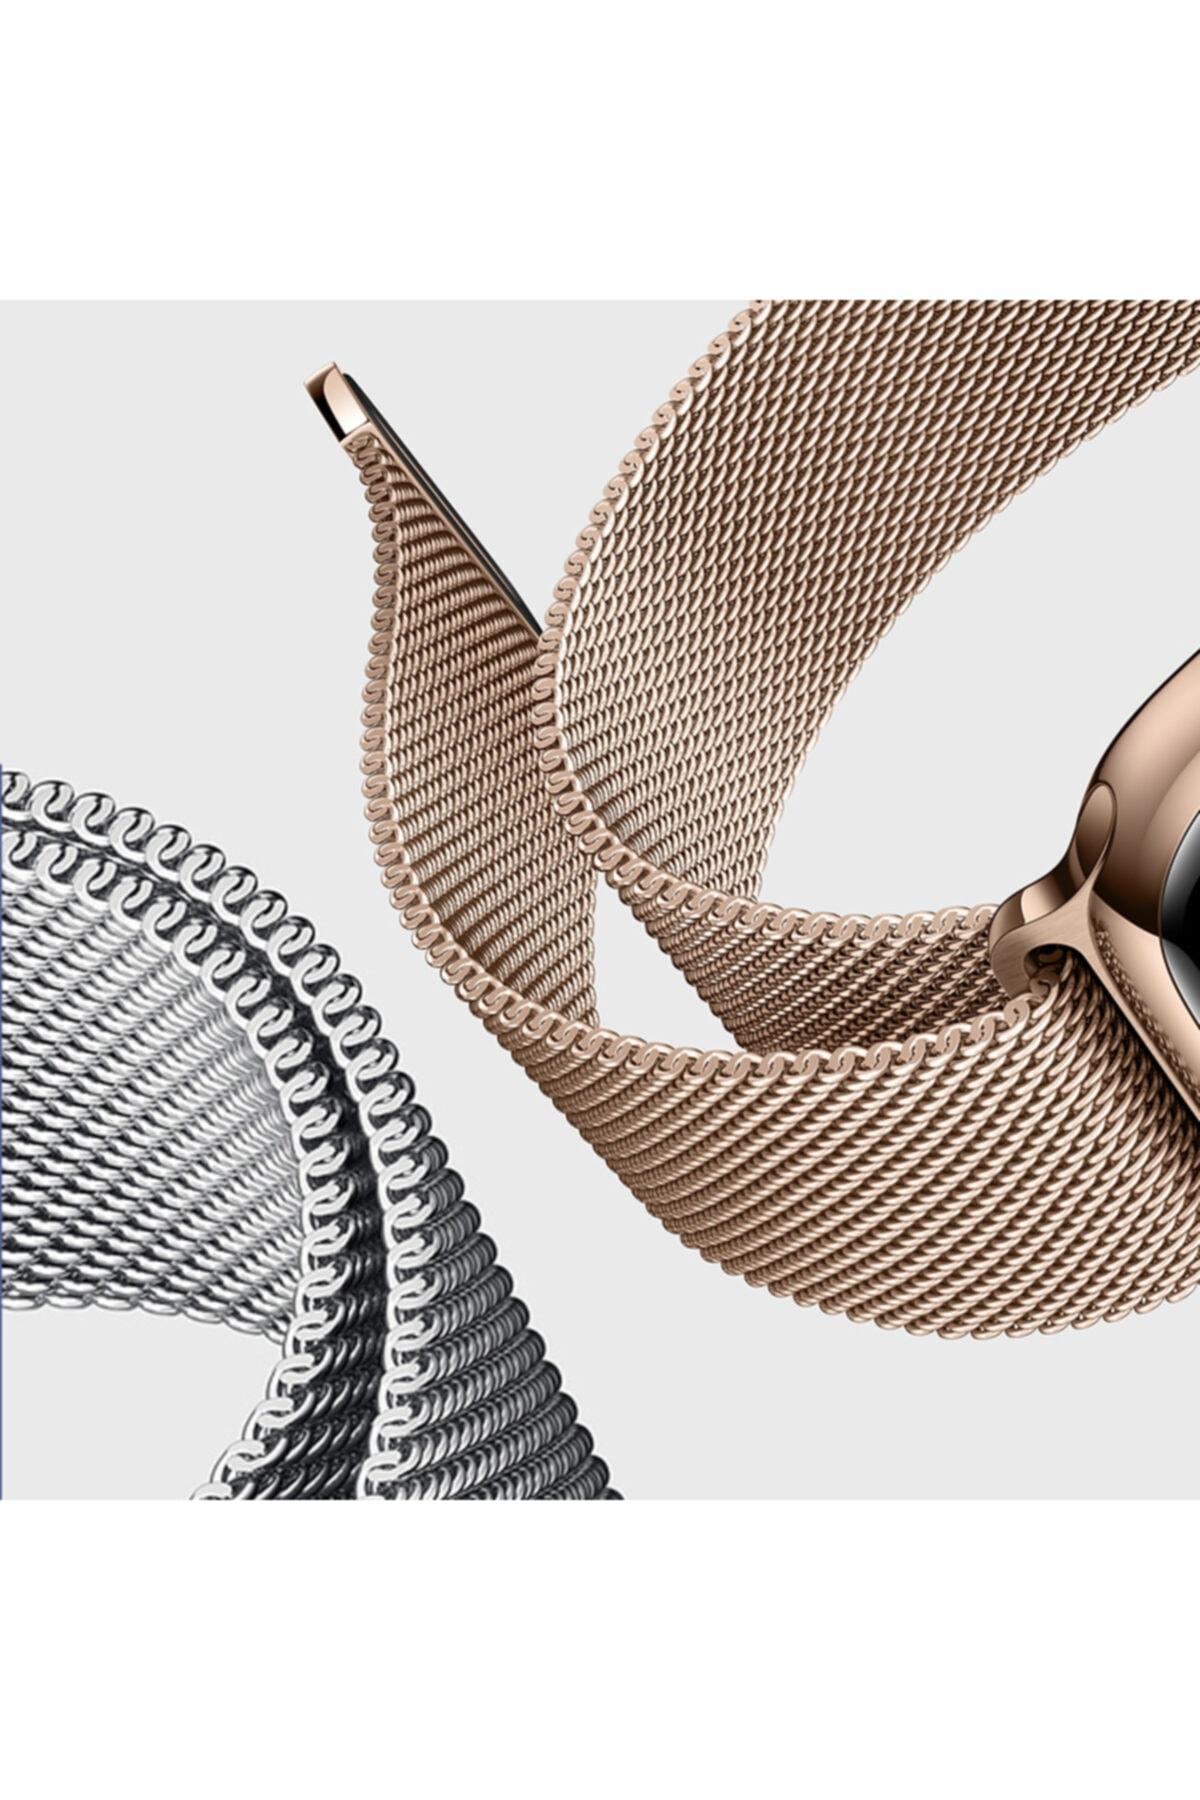 Microsonic Microsonic Watch 1 38mm Milanese Loop Kordon Rose Gold 2